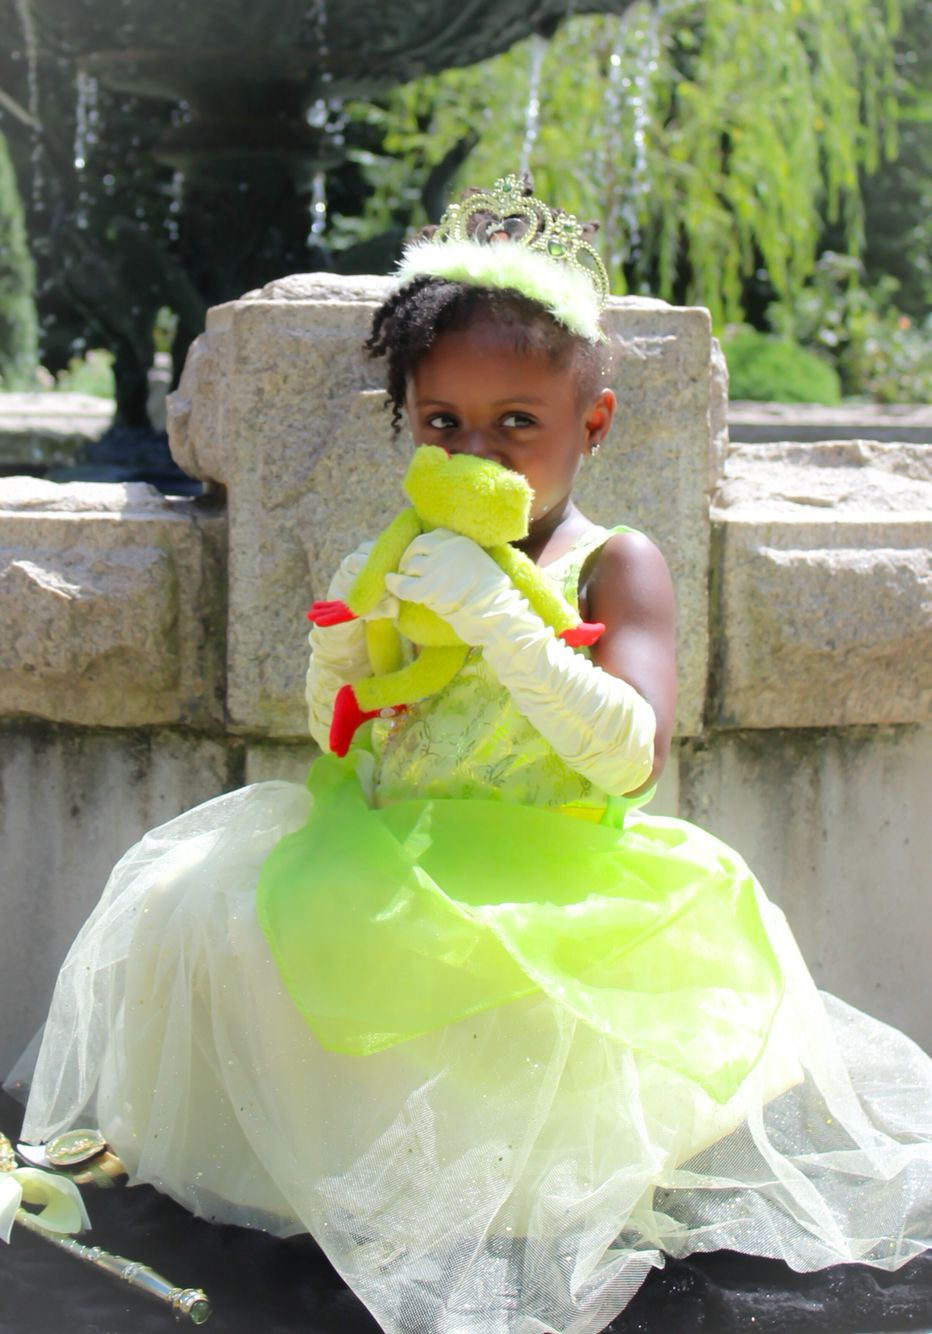 Sydney dressed as Princess Tiana (With images) Princess